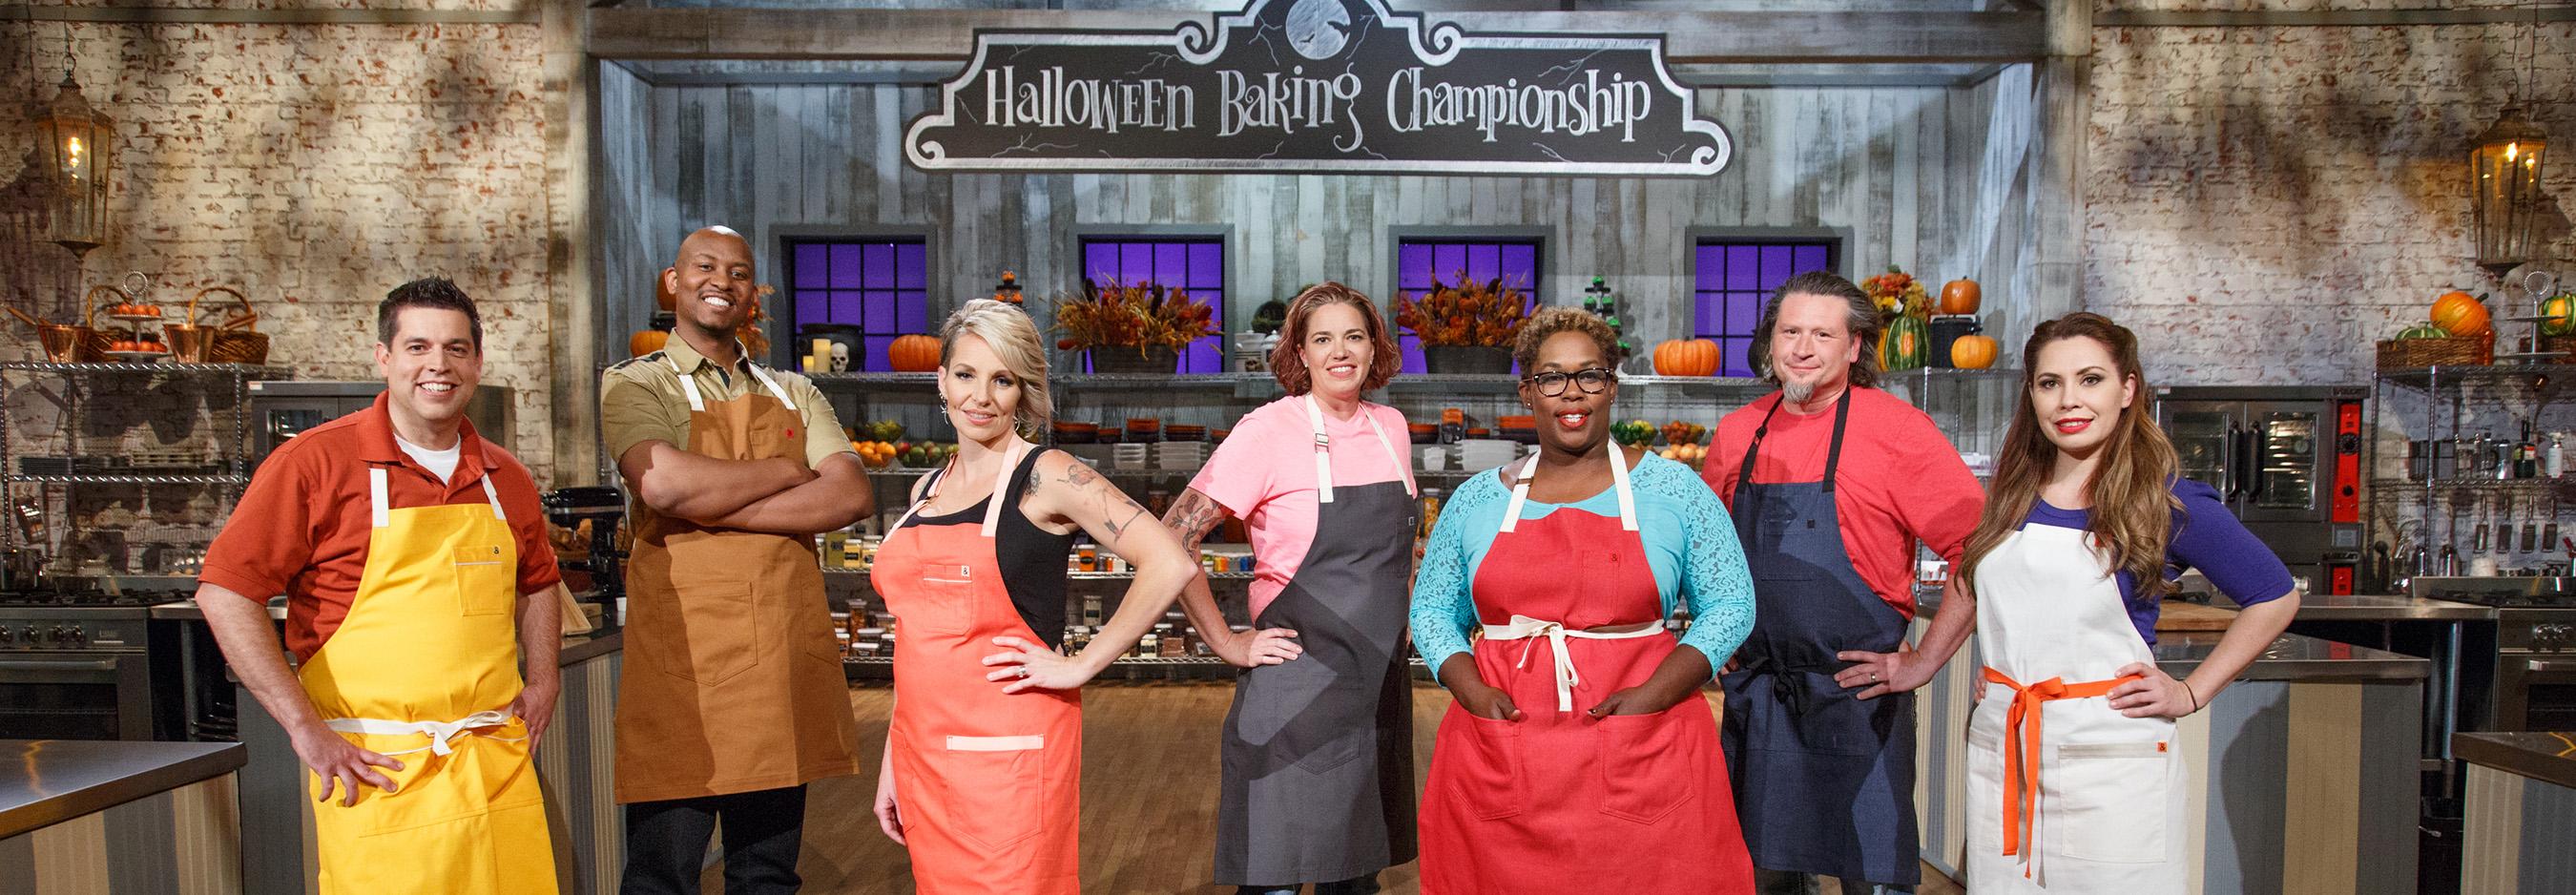 halloween baking championship 2020